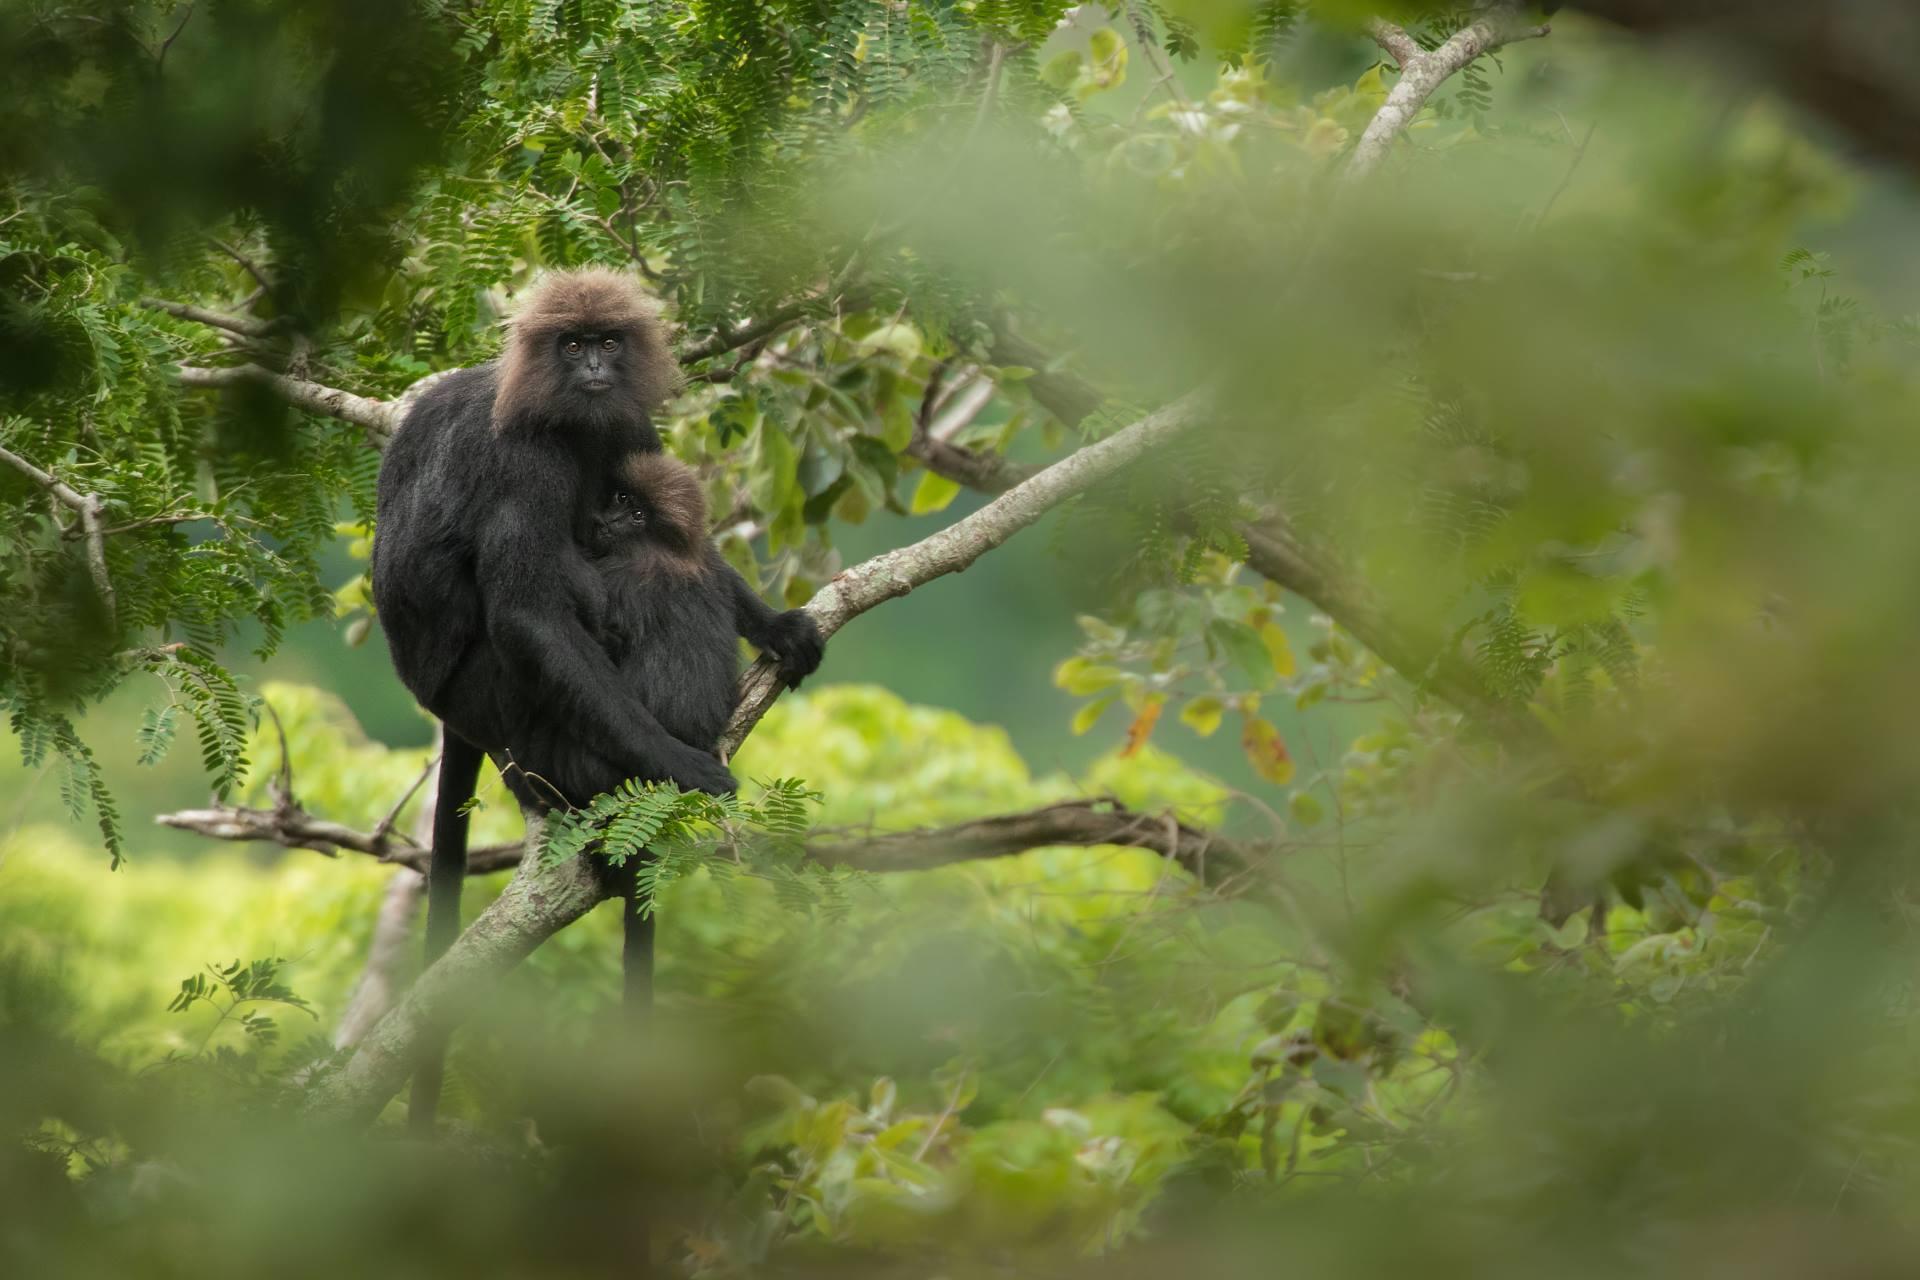 nilgiri langur, icons of anamalais, pollachi, valparai, topslip, chinnar, anamalai tiger reserve, parambikulam, monkey, langur, wildlife, conservation, pollachi papyrus, arvind ramamurthy,